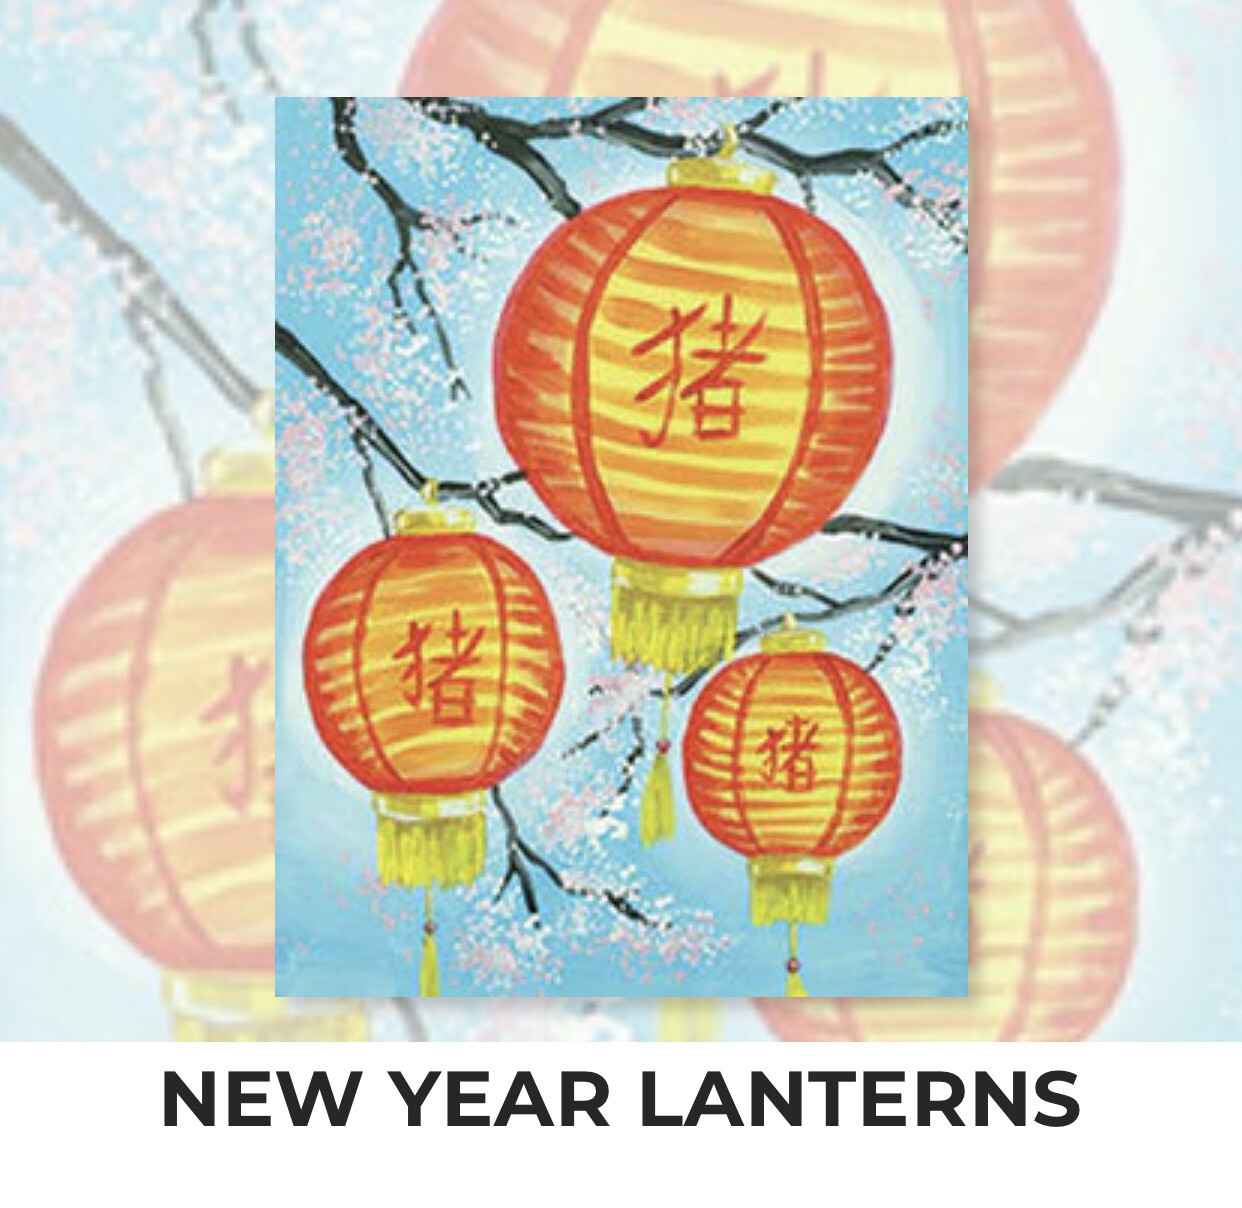 New Year Lanterns ADULT Acrylic Paint On Canvas DIY Art Kit - 3 Week Special Order